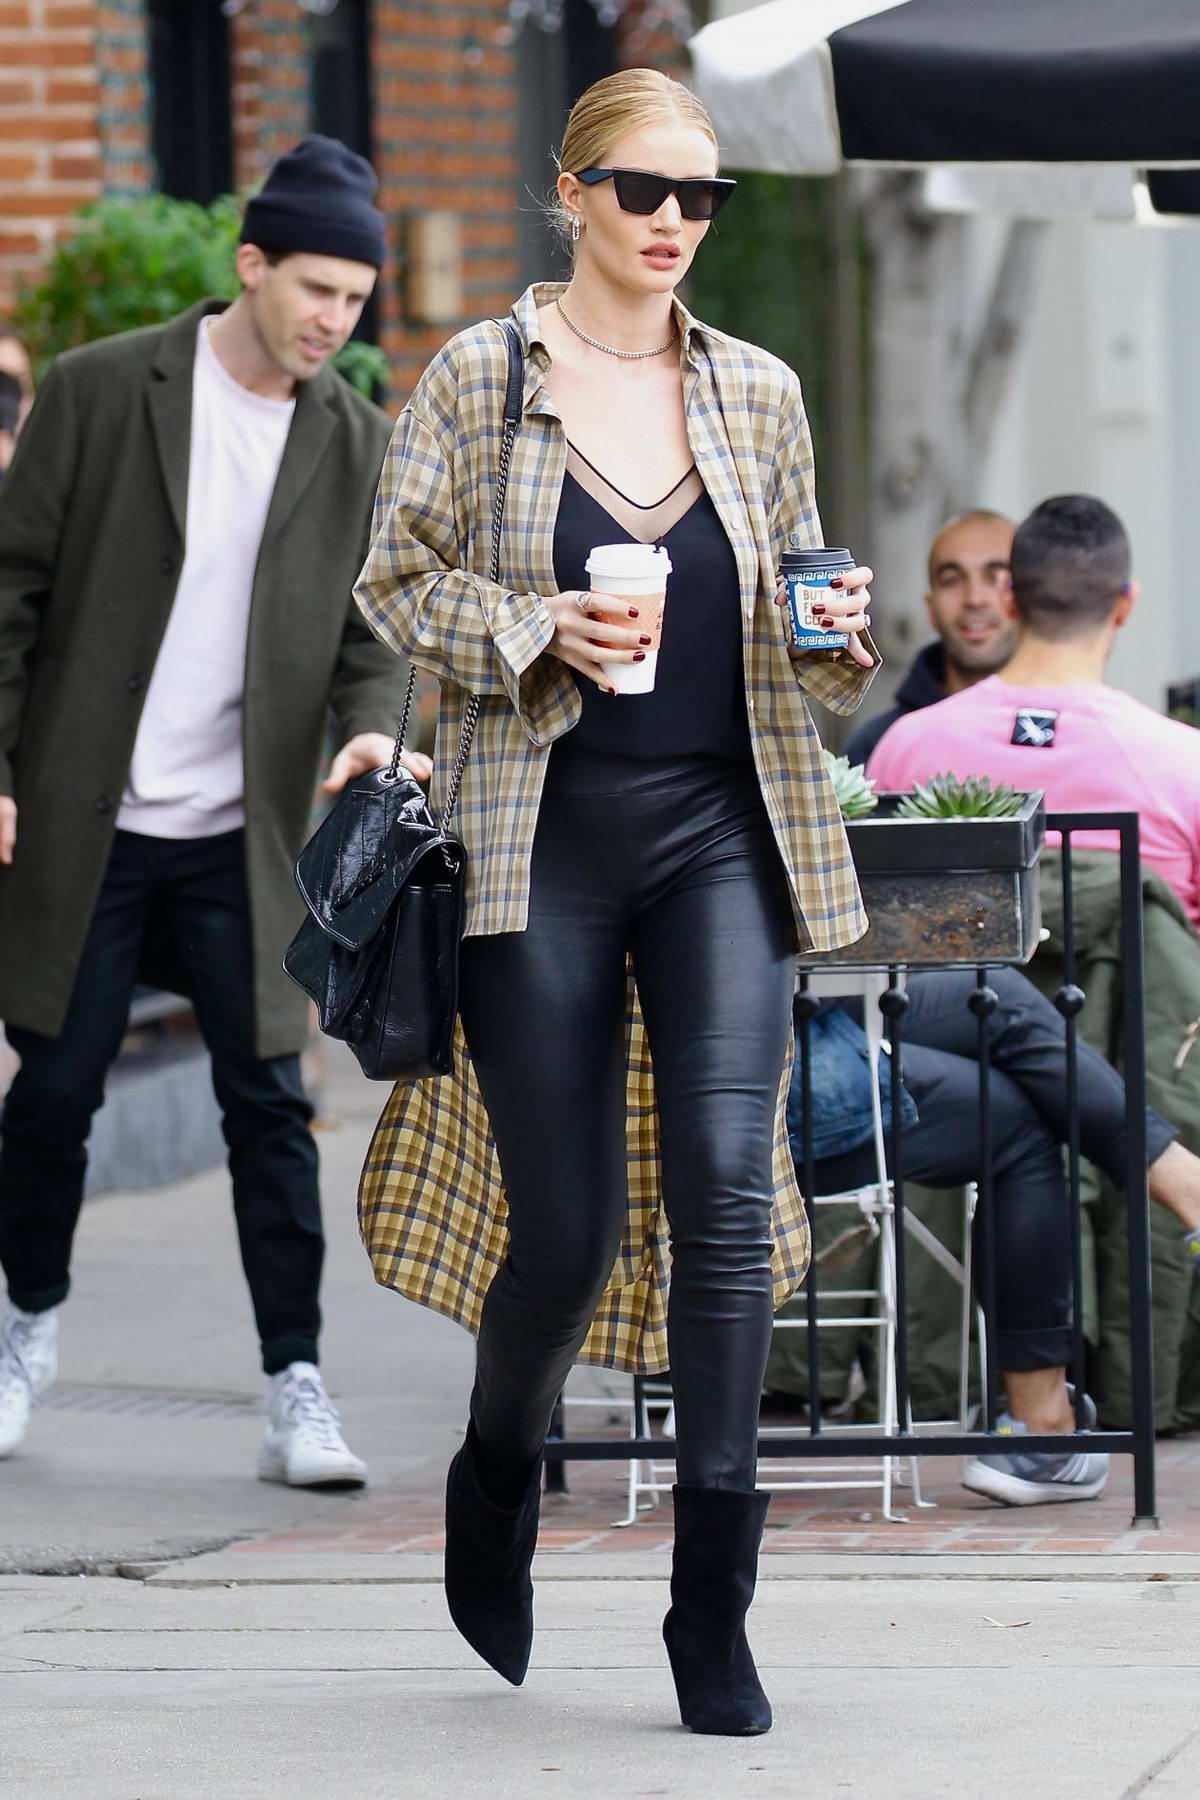 Jason Statham and Rosie Huntington-Whiteley take a walk